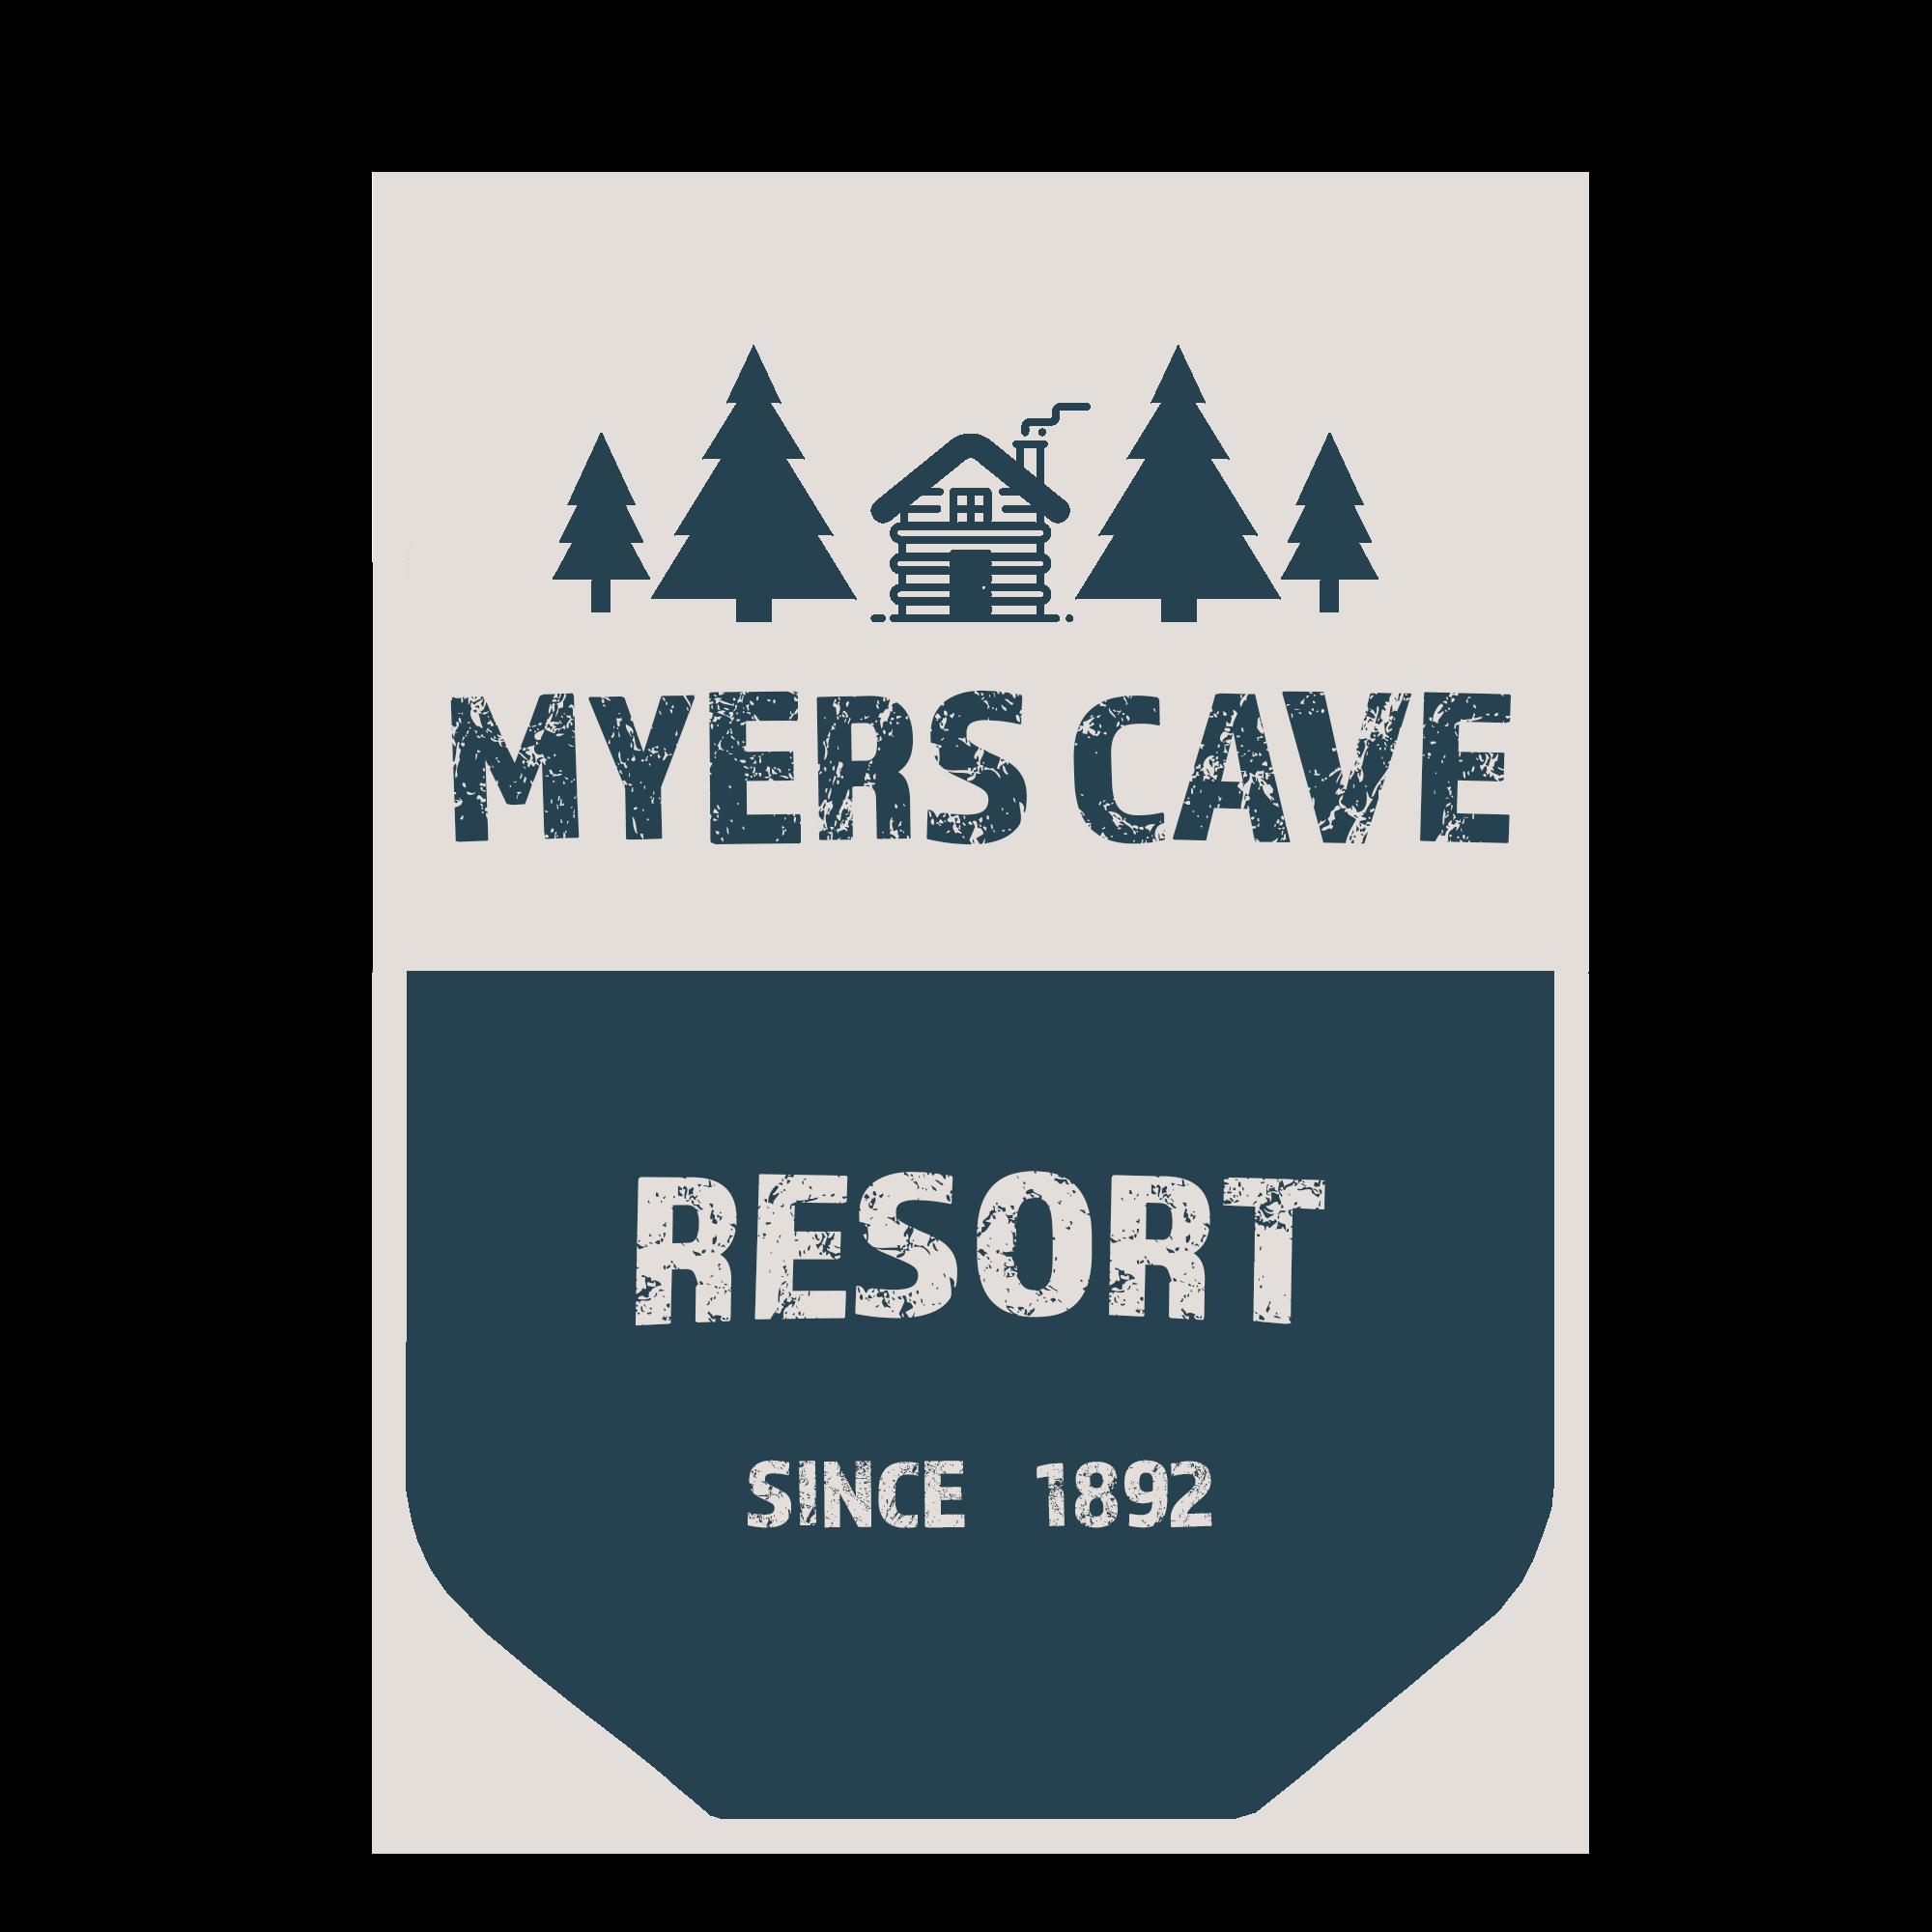 Myers Cave Resort